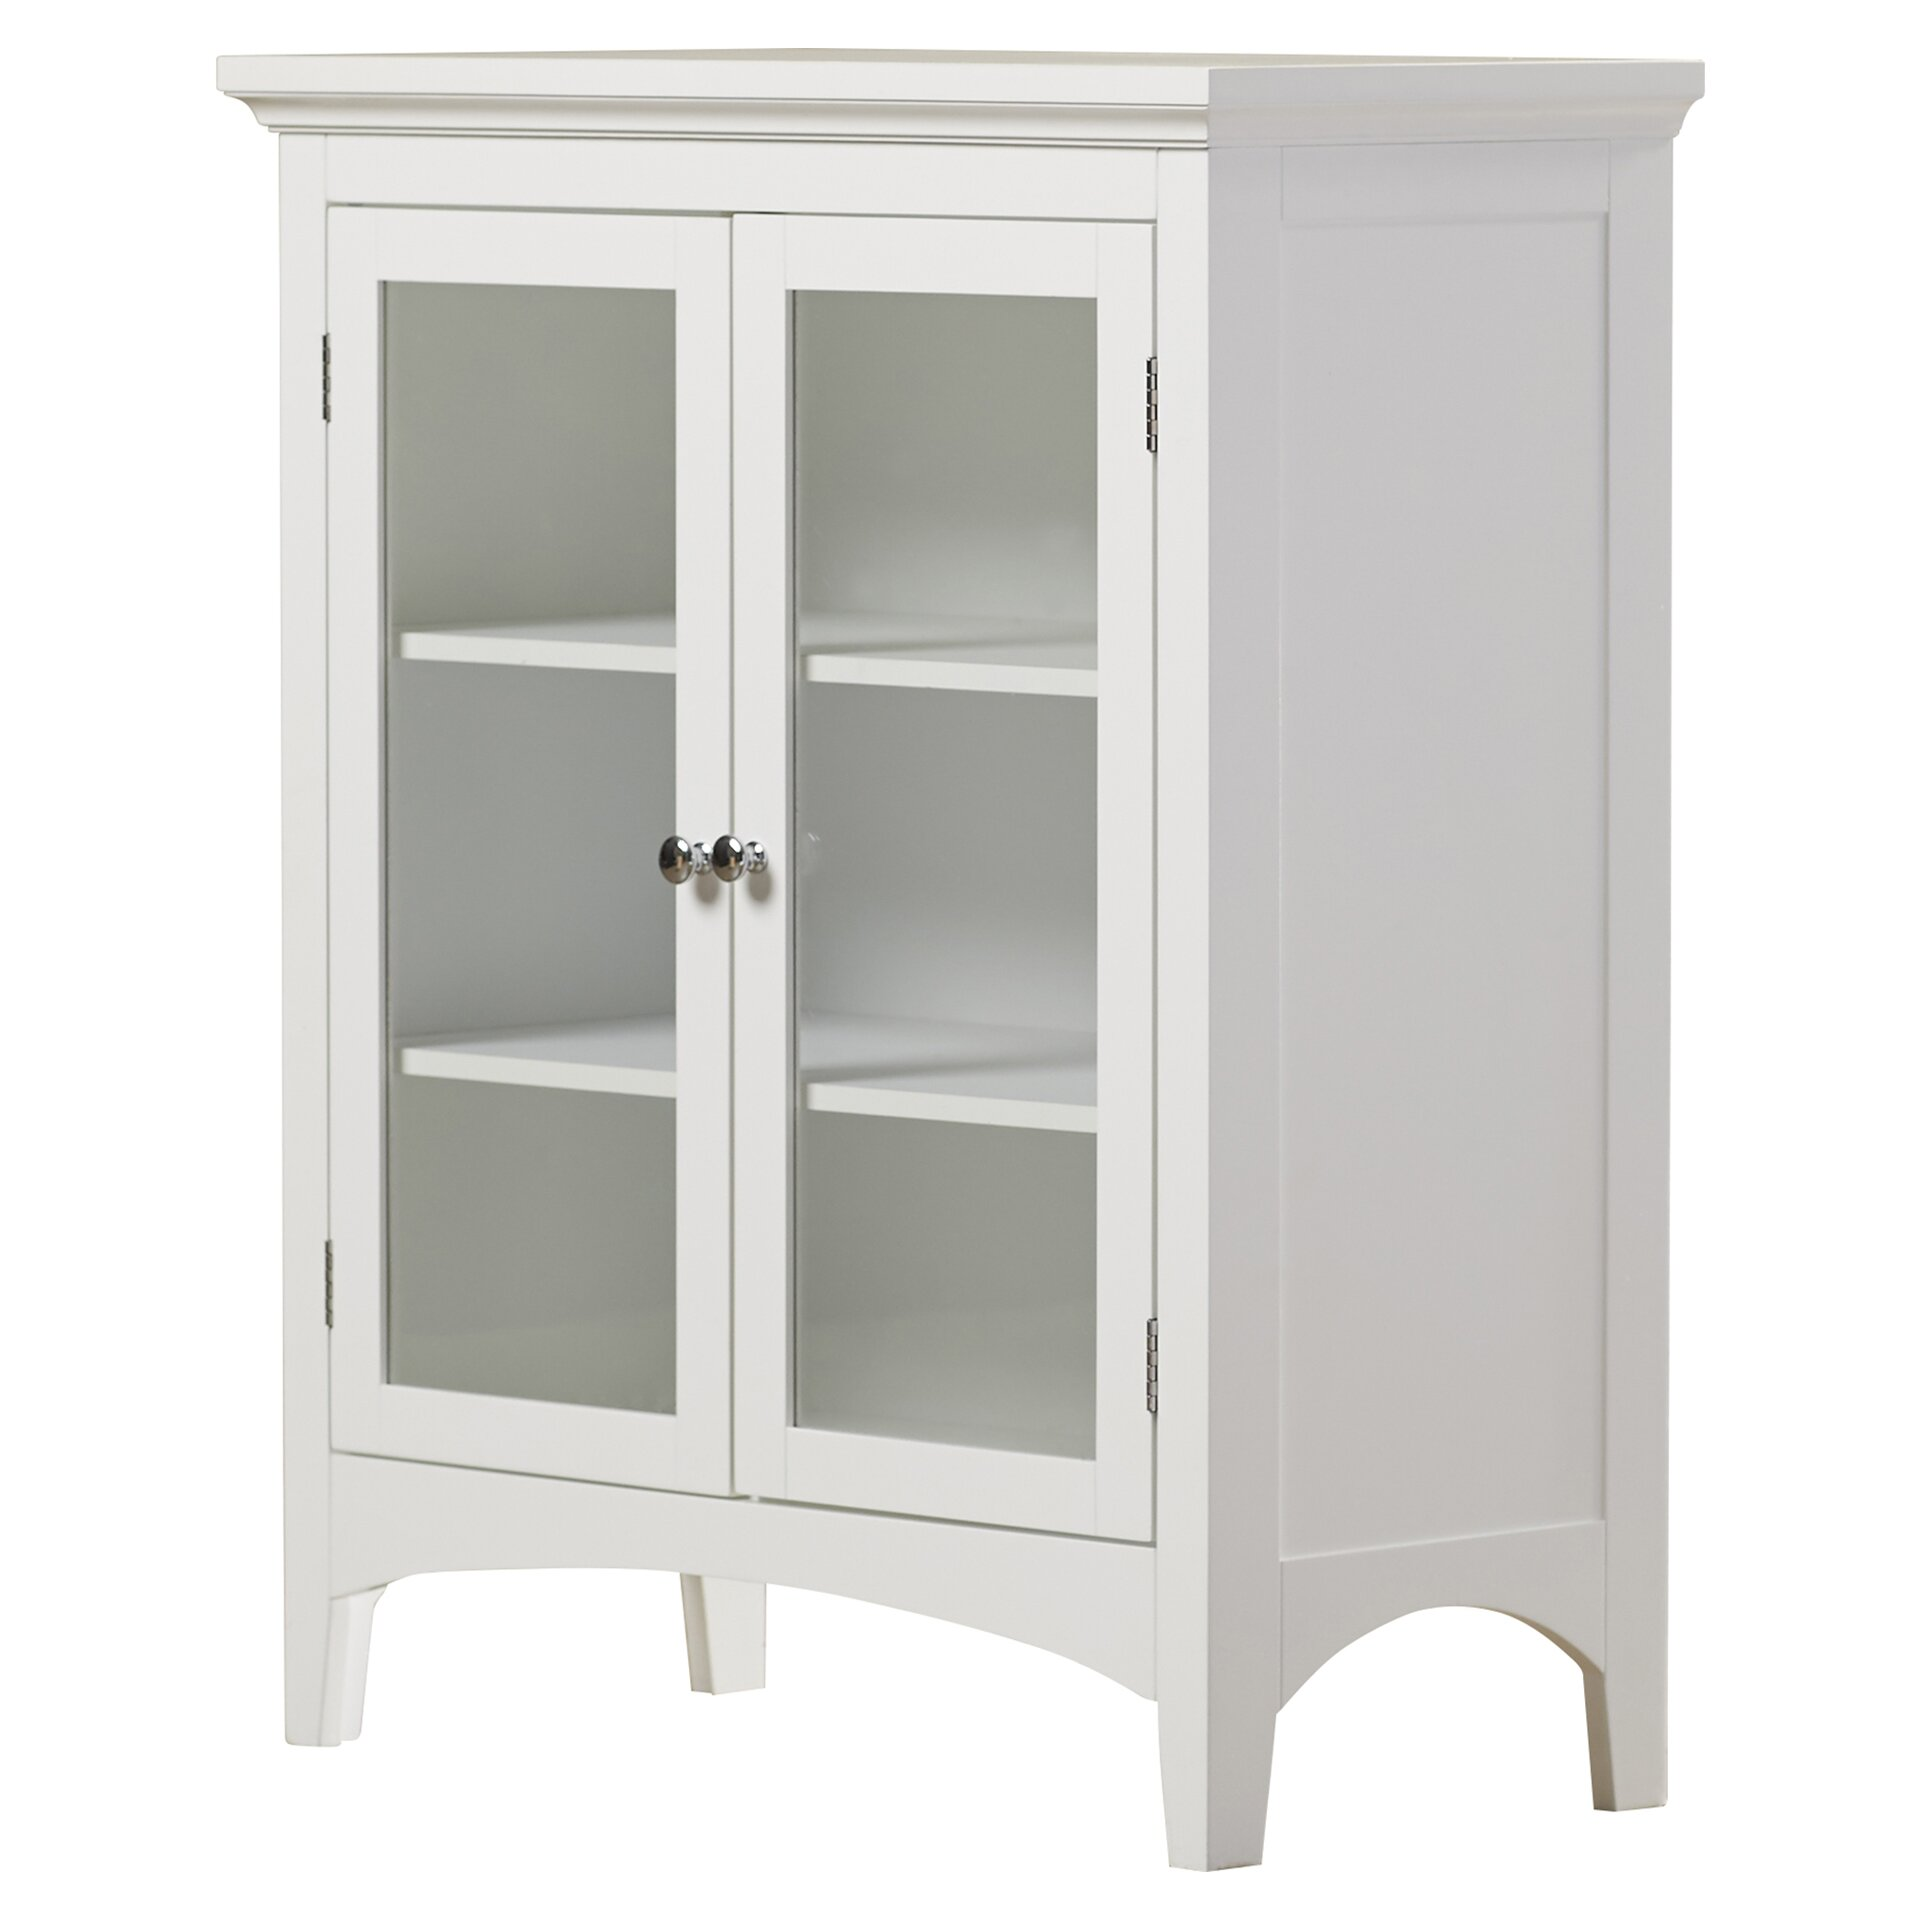 Sumter Cabinet Bedroom Furniture Tuforcecom